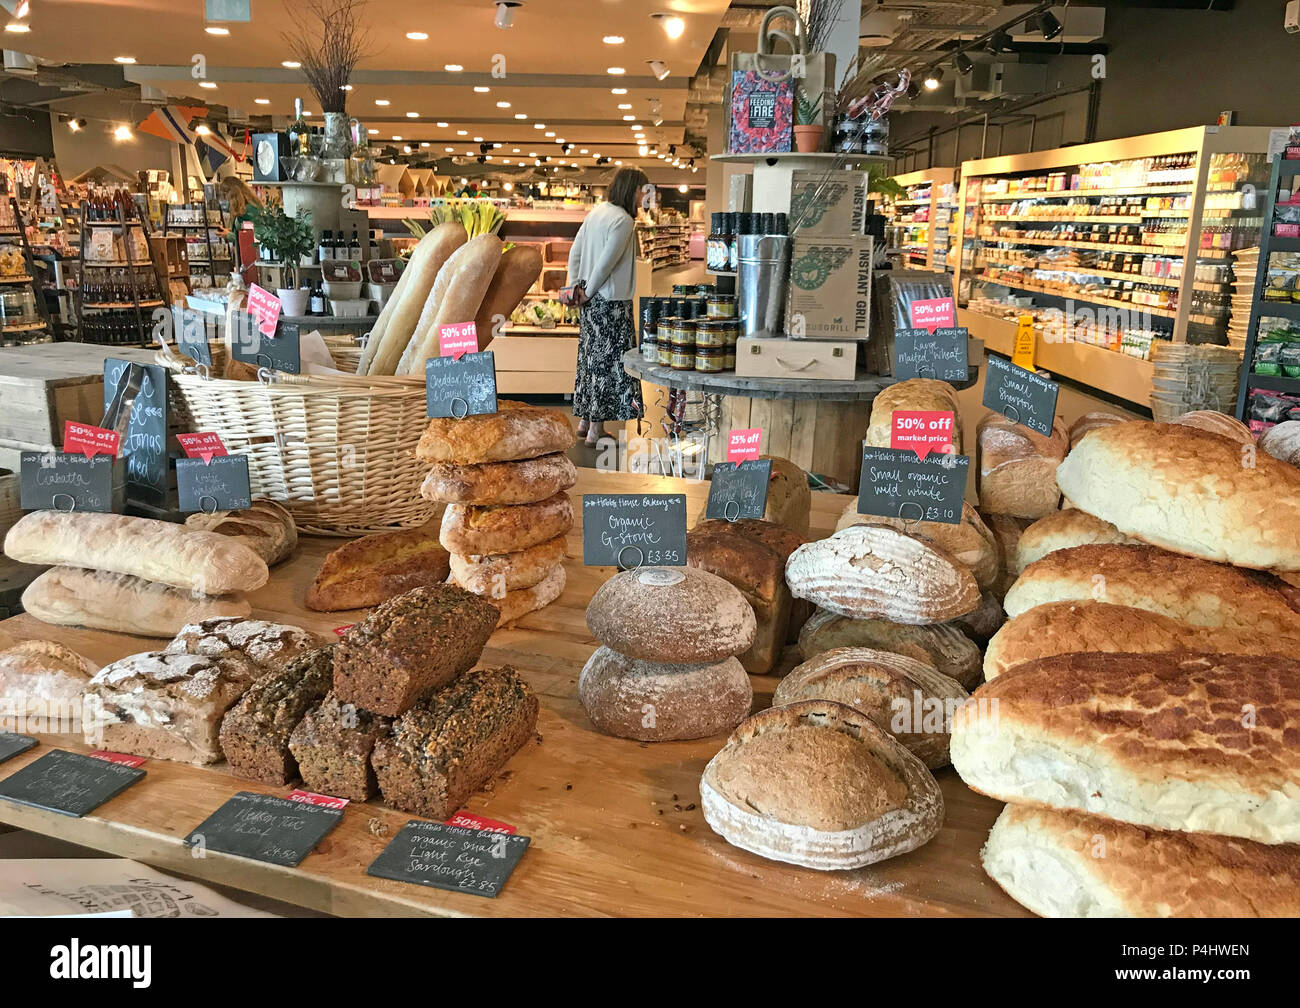 Laden Sie dieses Alamy Stockfoto Artisan Brot, M 5 Gloucester Hofladen Raststätte, Gloucestershire, England, Großbritannien - P4HWEN